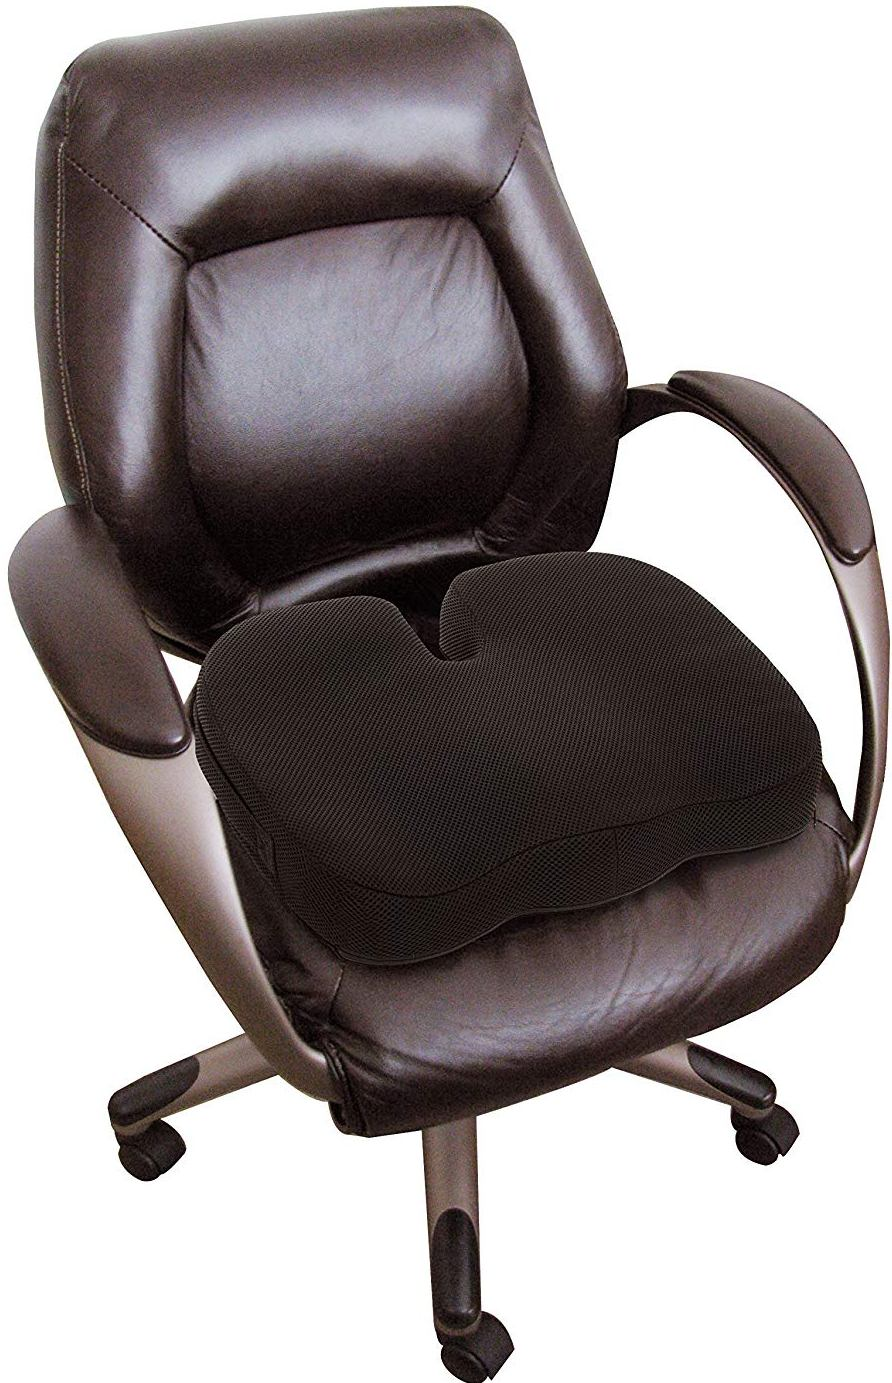 TravelMate® Coccyx Orthopedic Seat Cushion